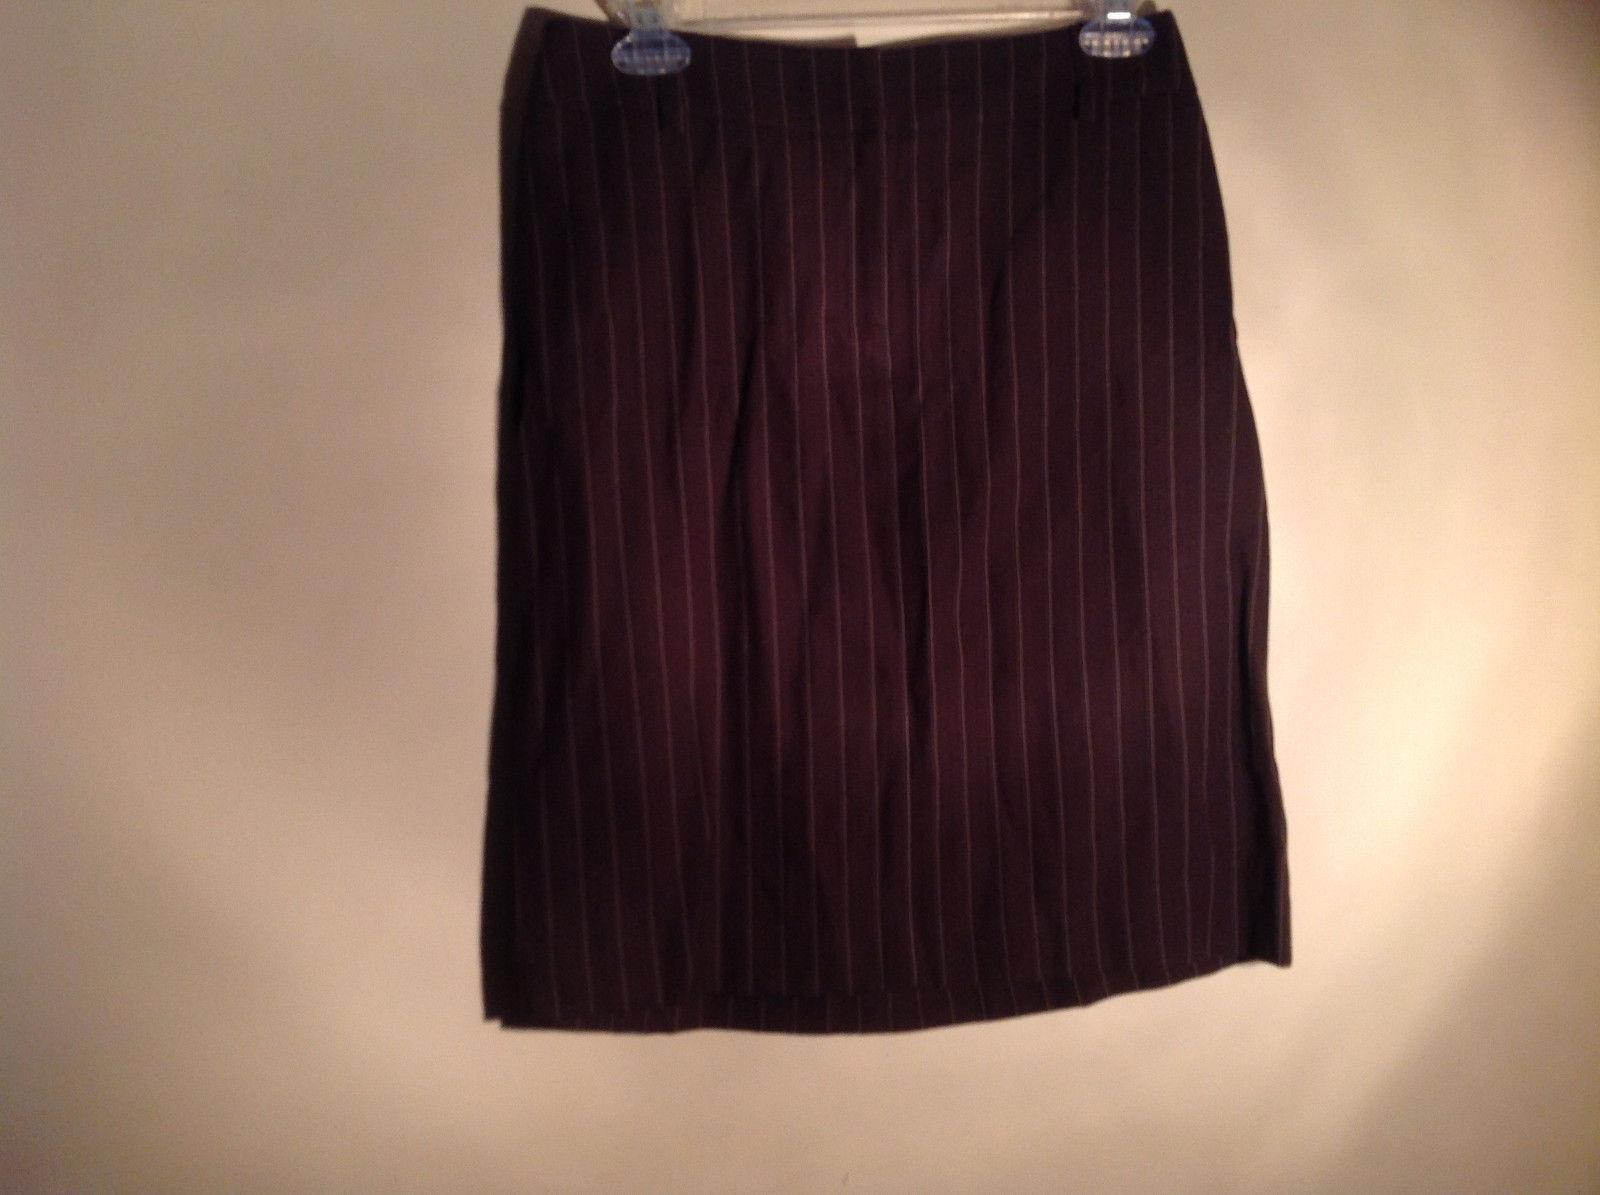 Kenar Brown with Pink Stripes Skirt Back Zipper Closure Belt Loops Size 4